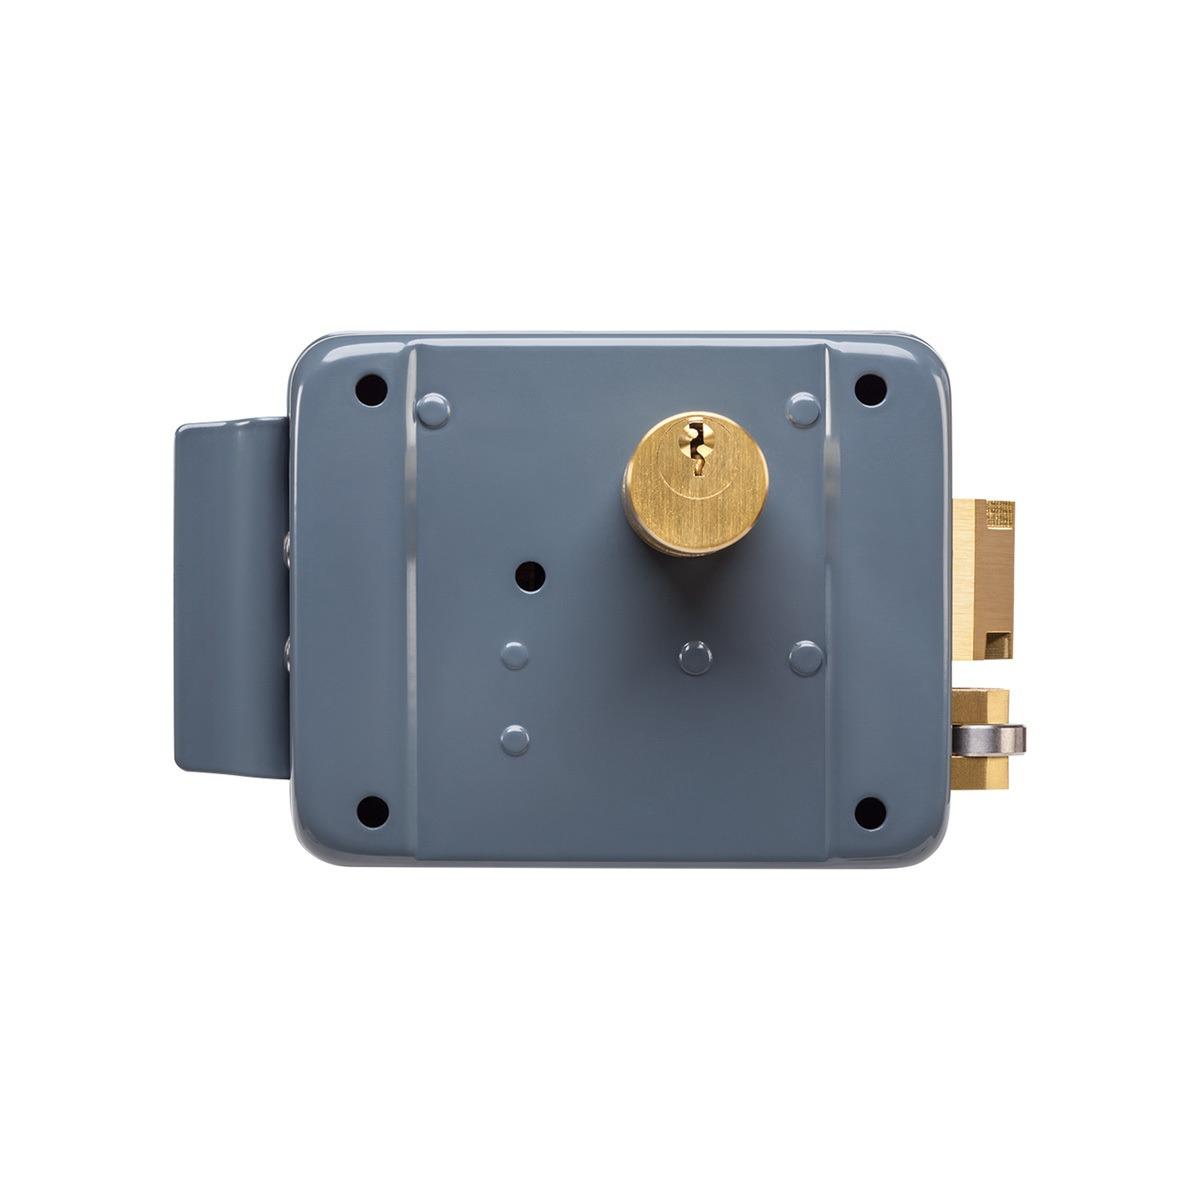 Fechadura Elétrica de Cilindro Fixo Intelbras FX 2000 CINZA